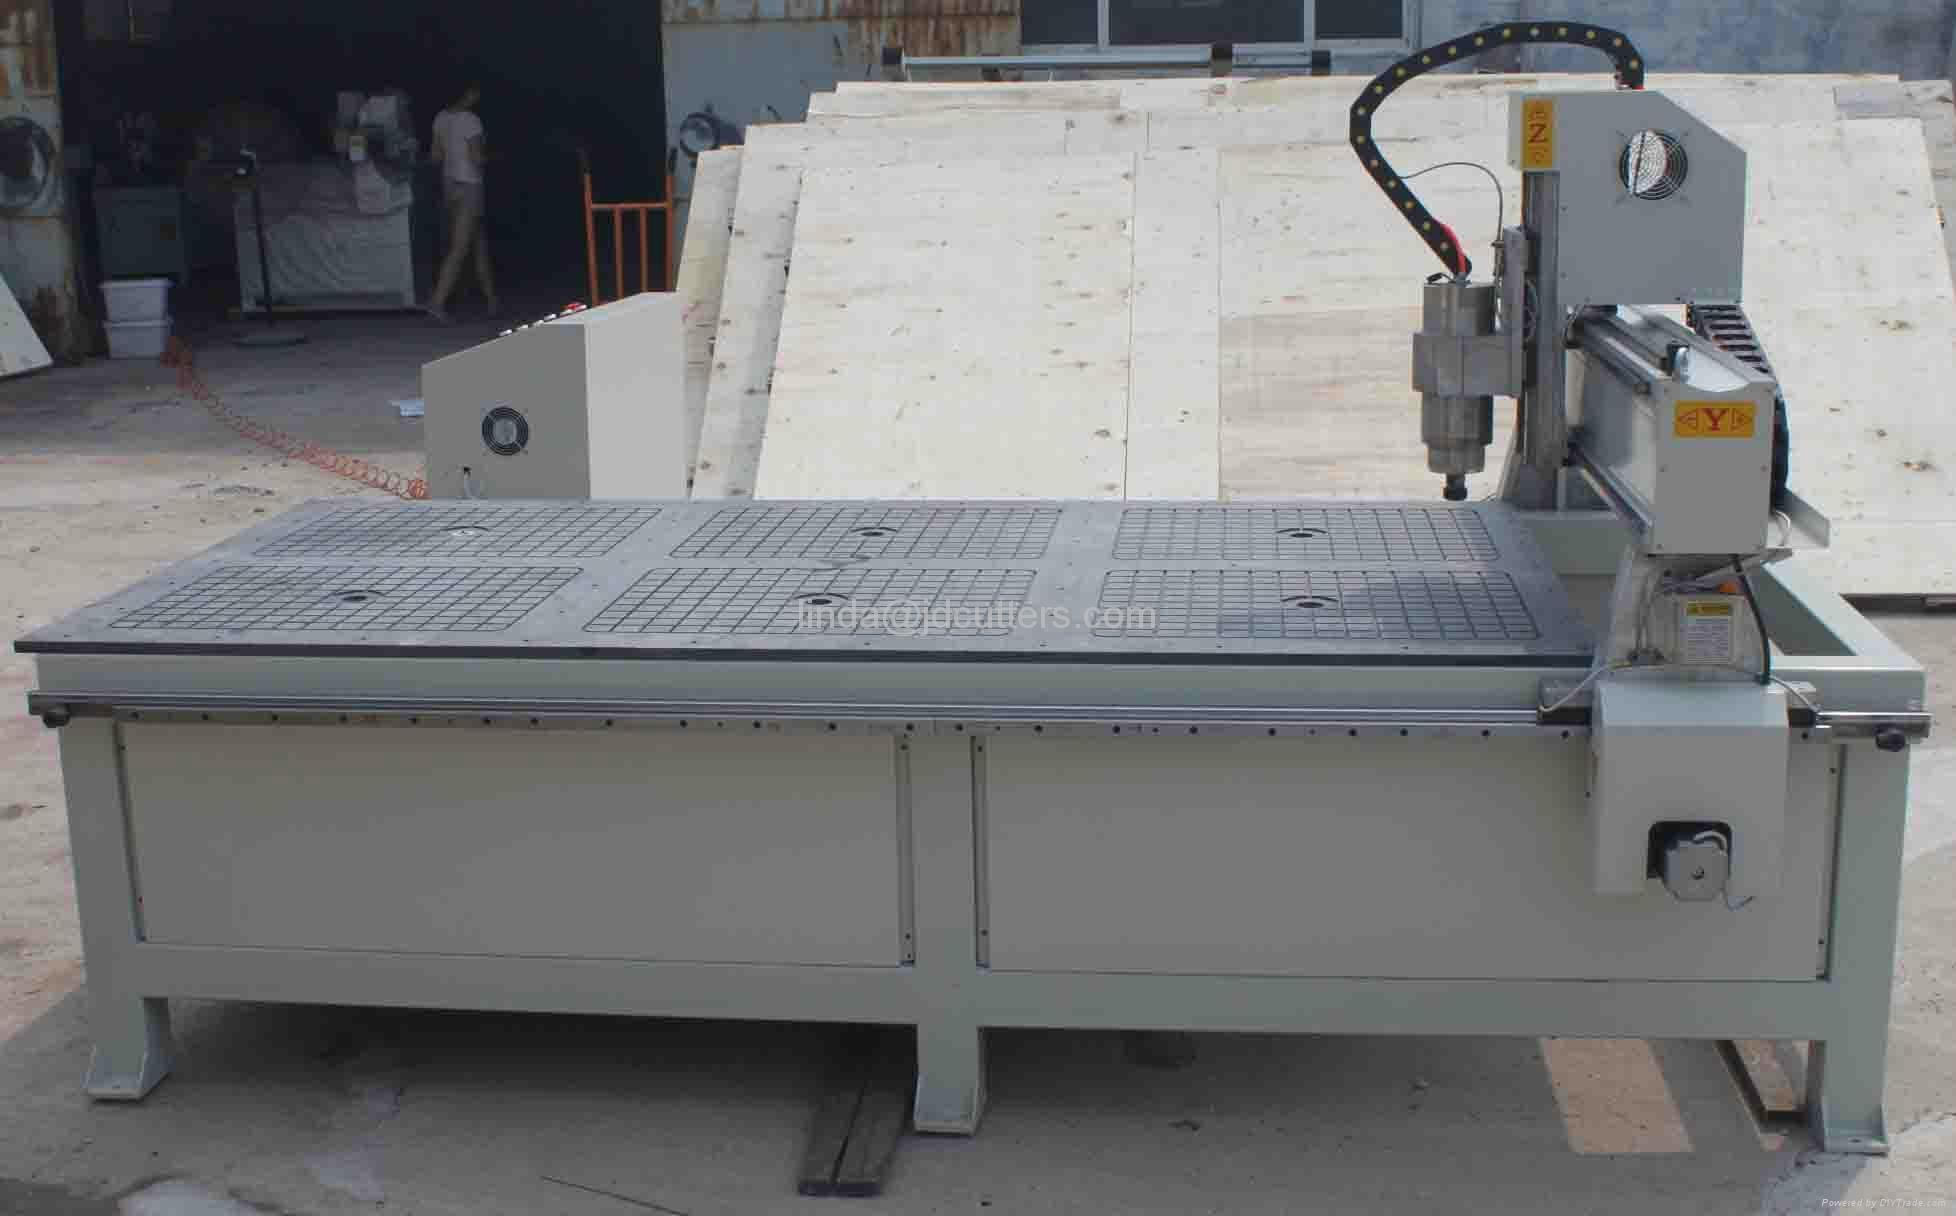 Jdm25 Woodworking Machine Wood Cnc Router Wood Door Furniture Making Machine Jindiao China